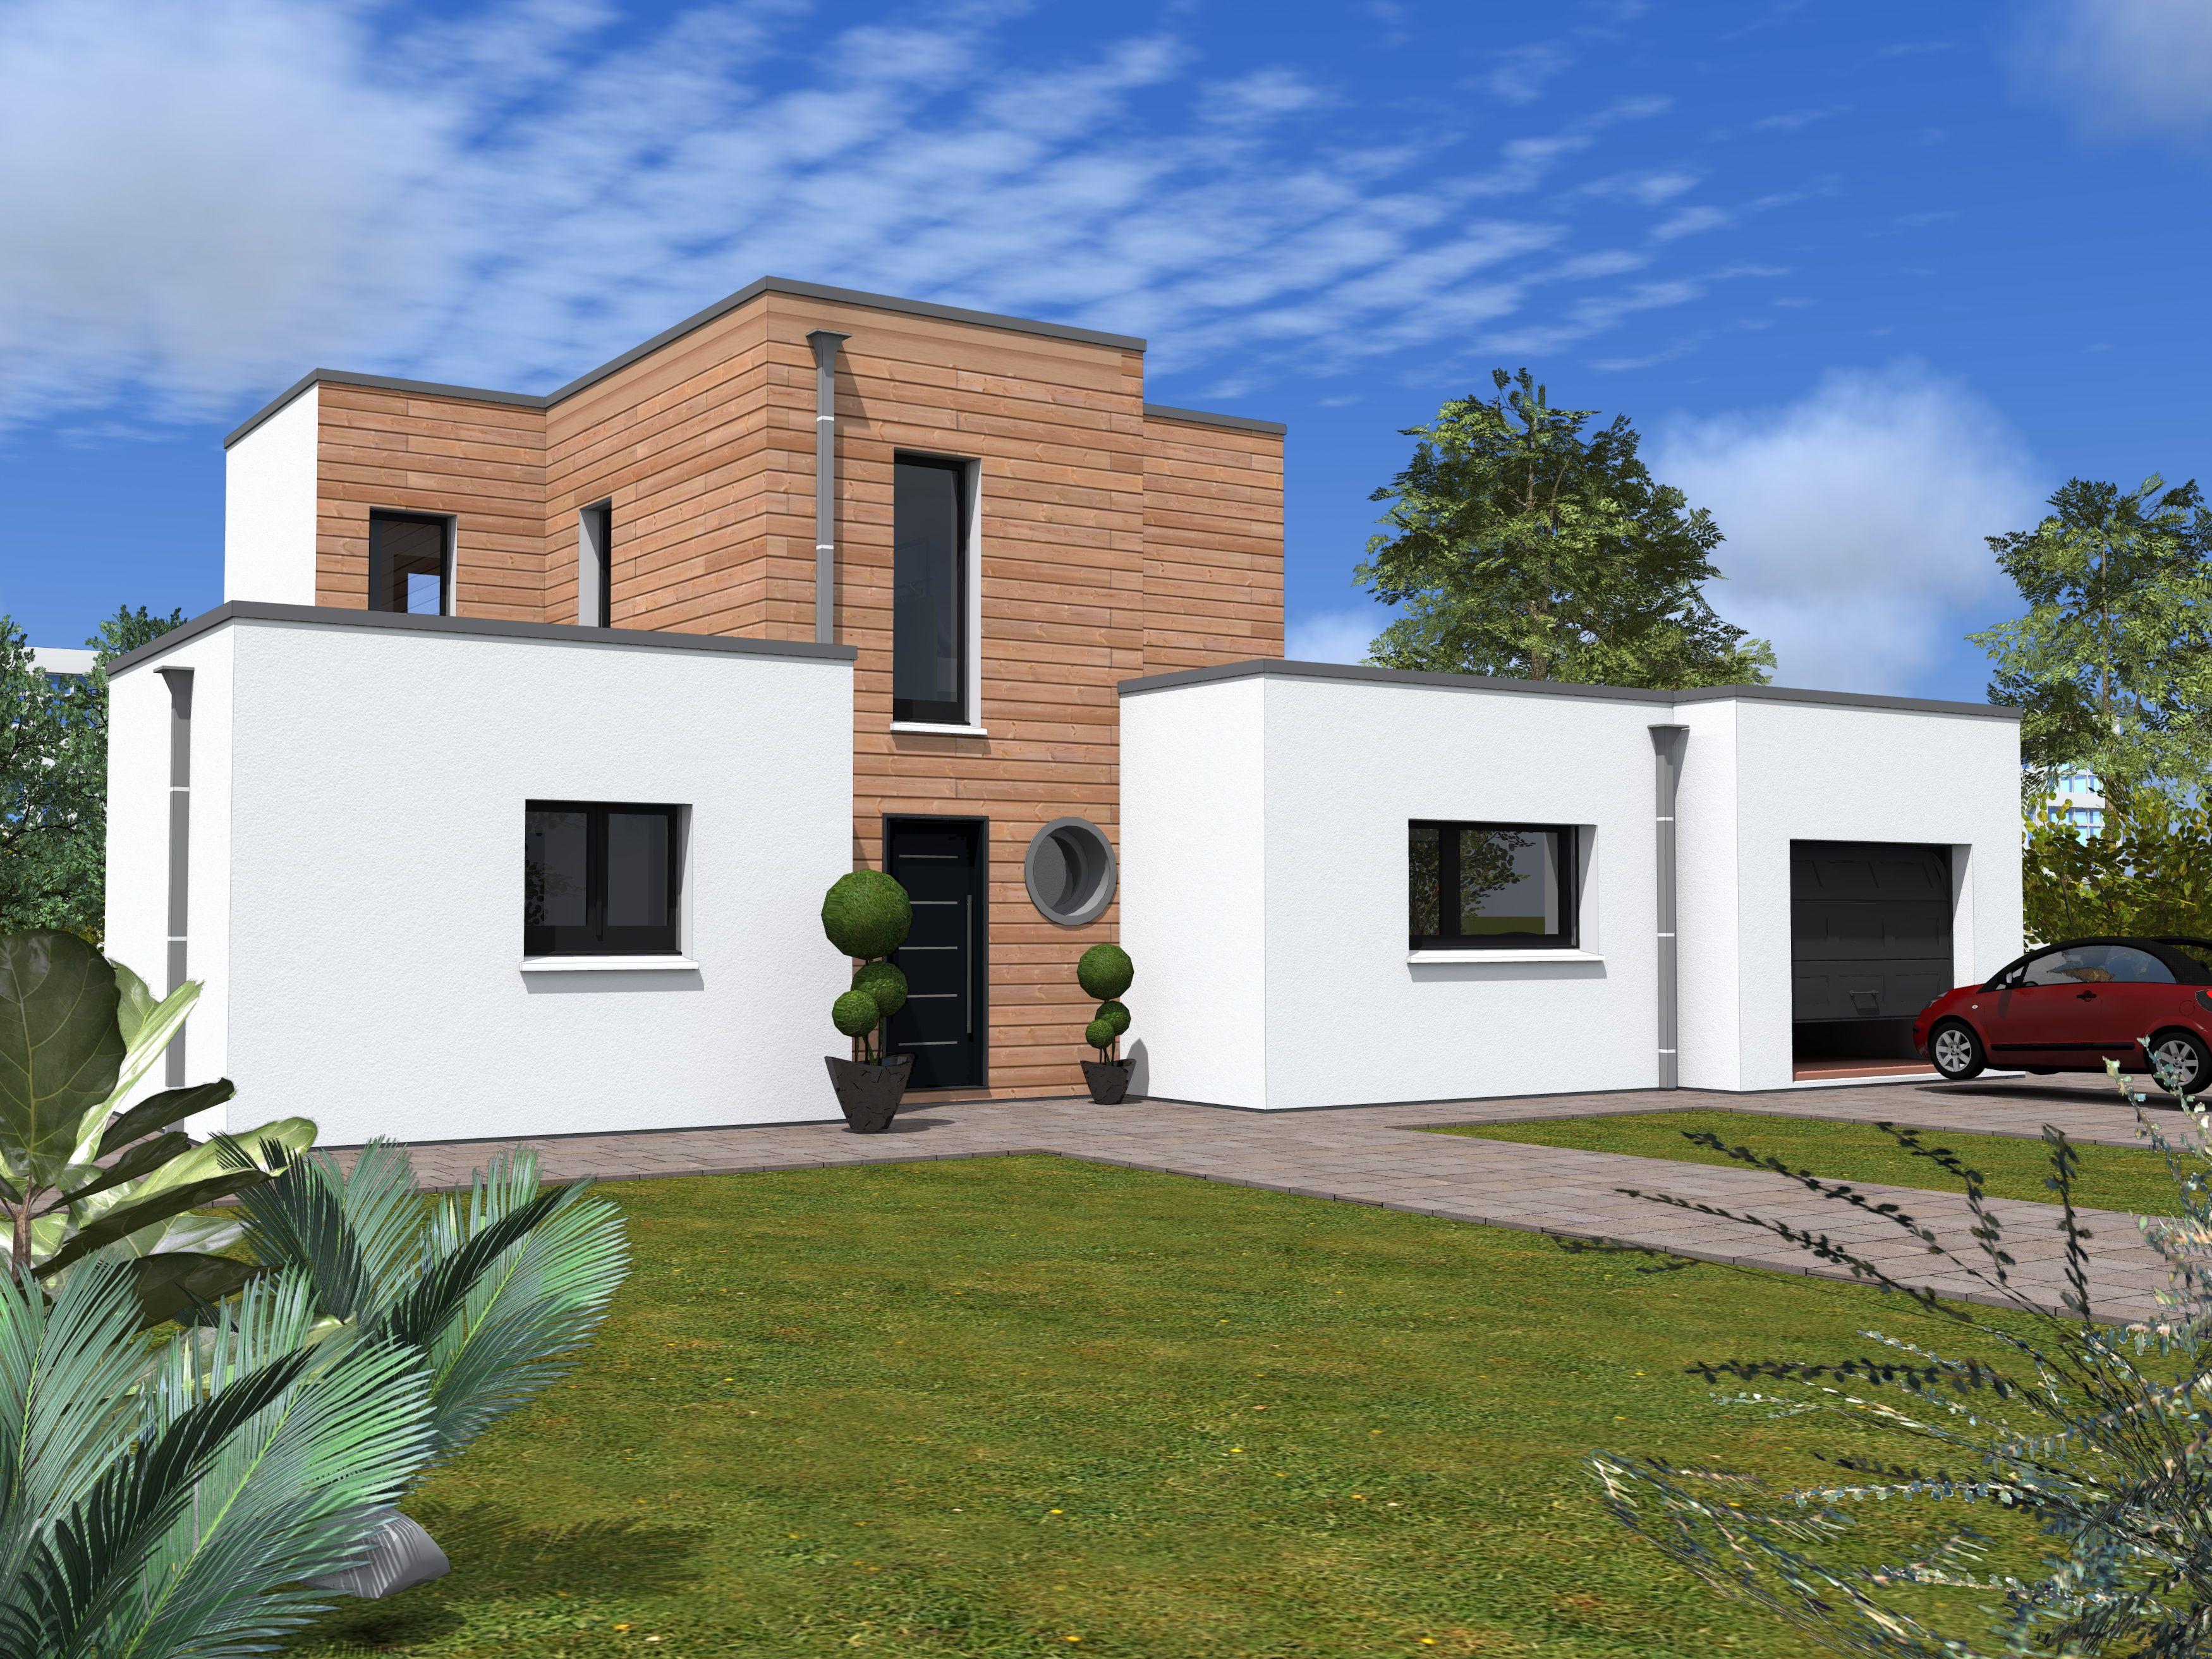 Modele facade maison for Modele facade maison